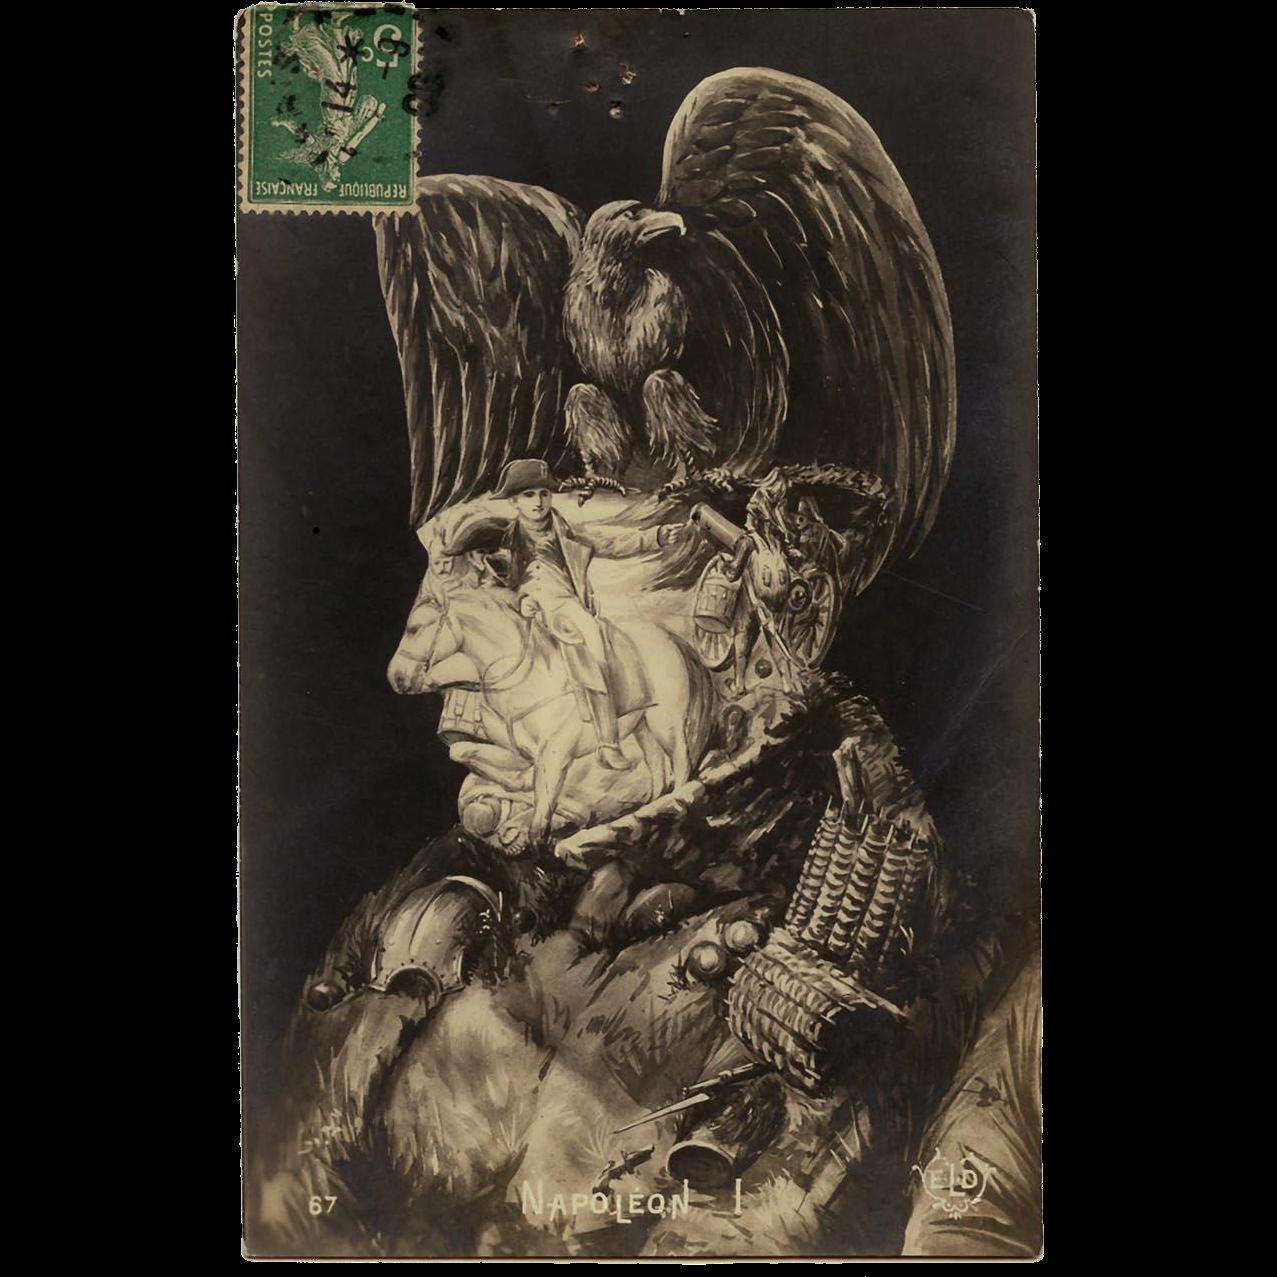 Surreal Arcimboldo Style Collage of Napoleon Bonaparte Antique French Postcard